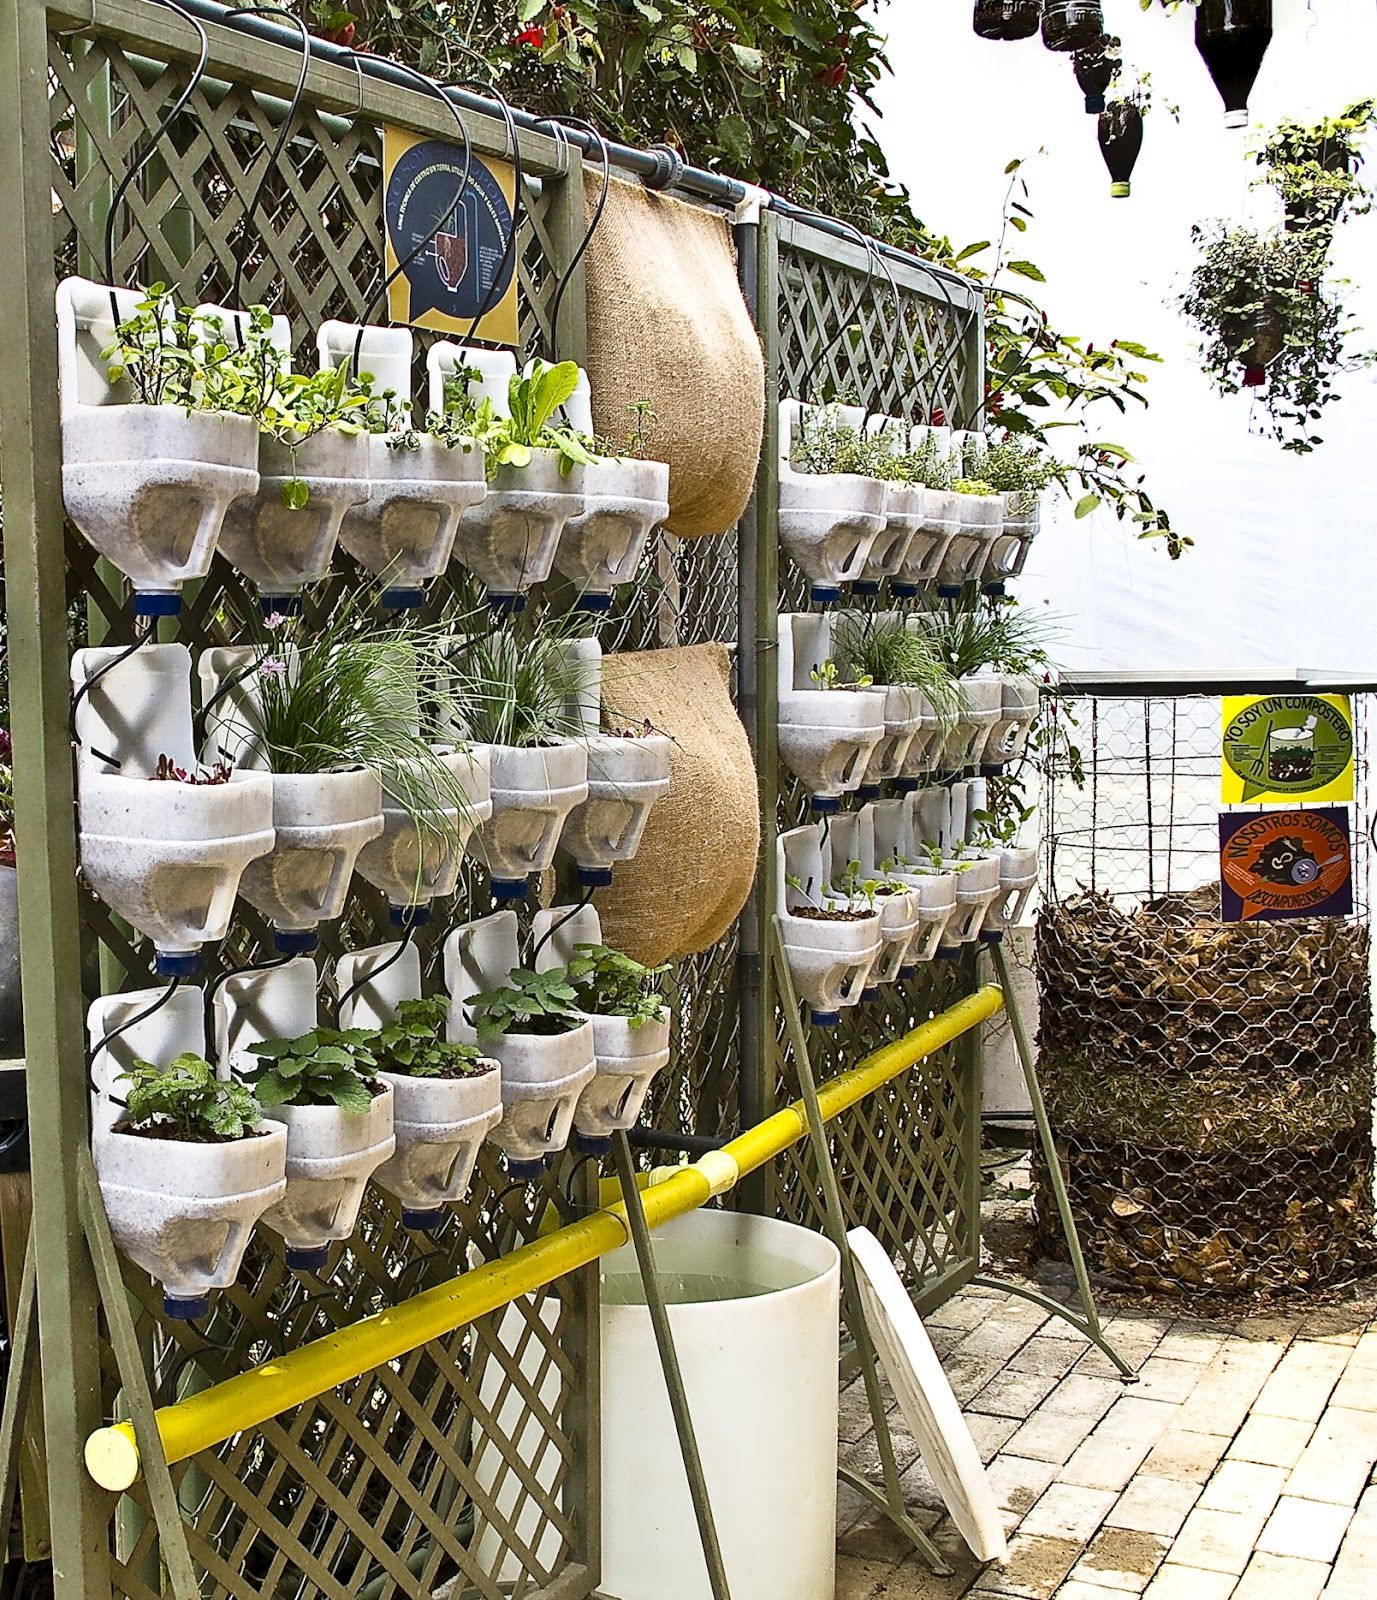 Jardin vertical plantas aromaticas buscar con google - Jardin de aromaticas ...